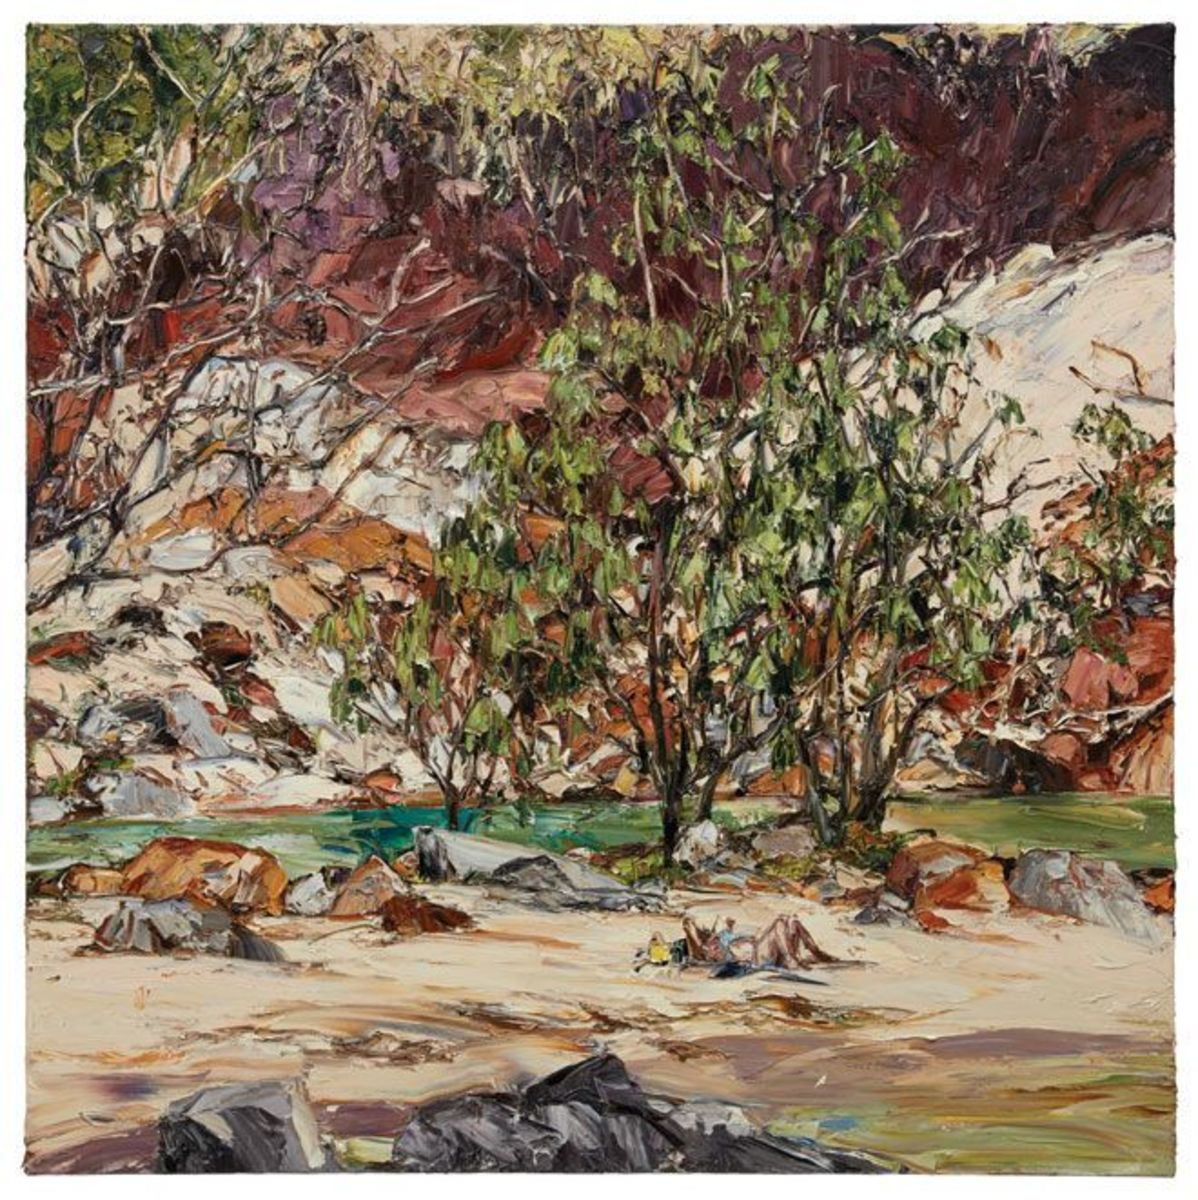 Estuary figure (swamp oaks and book)